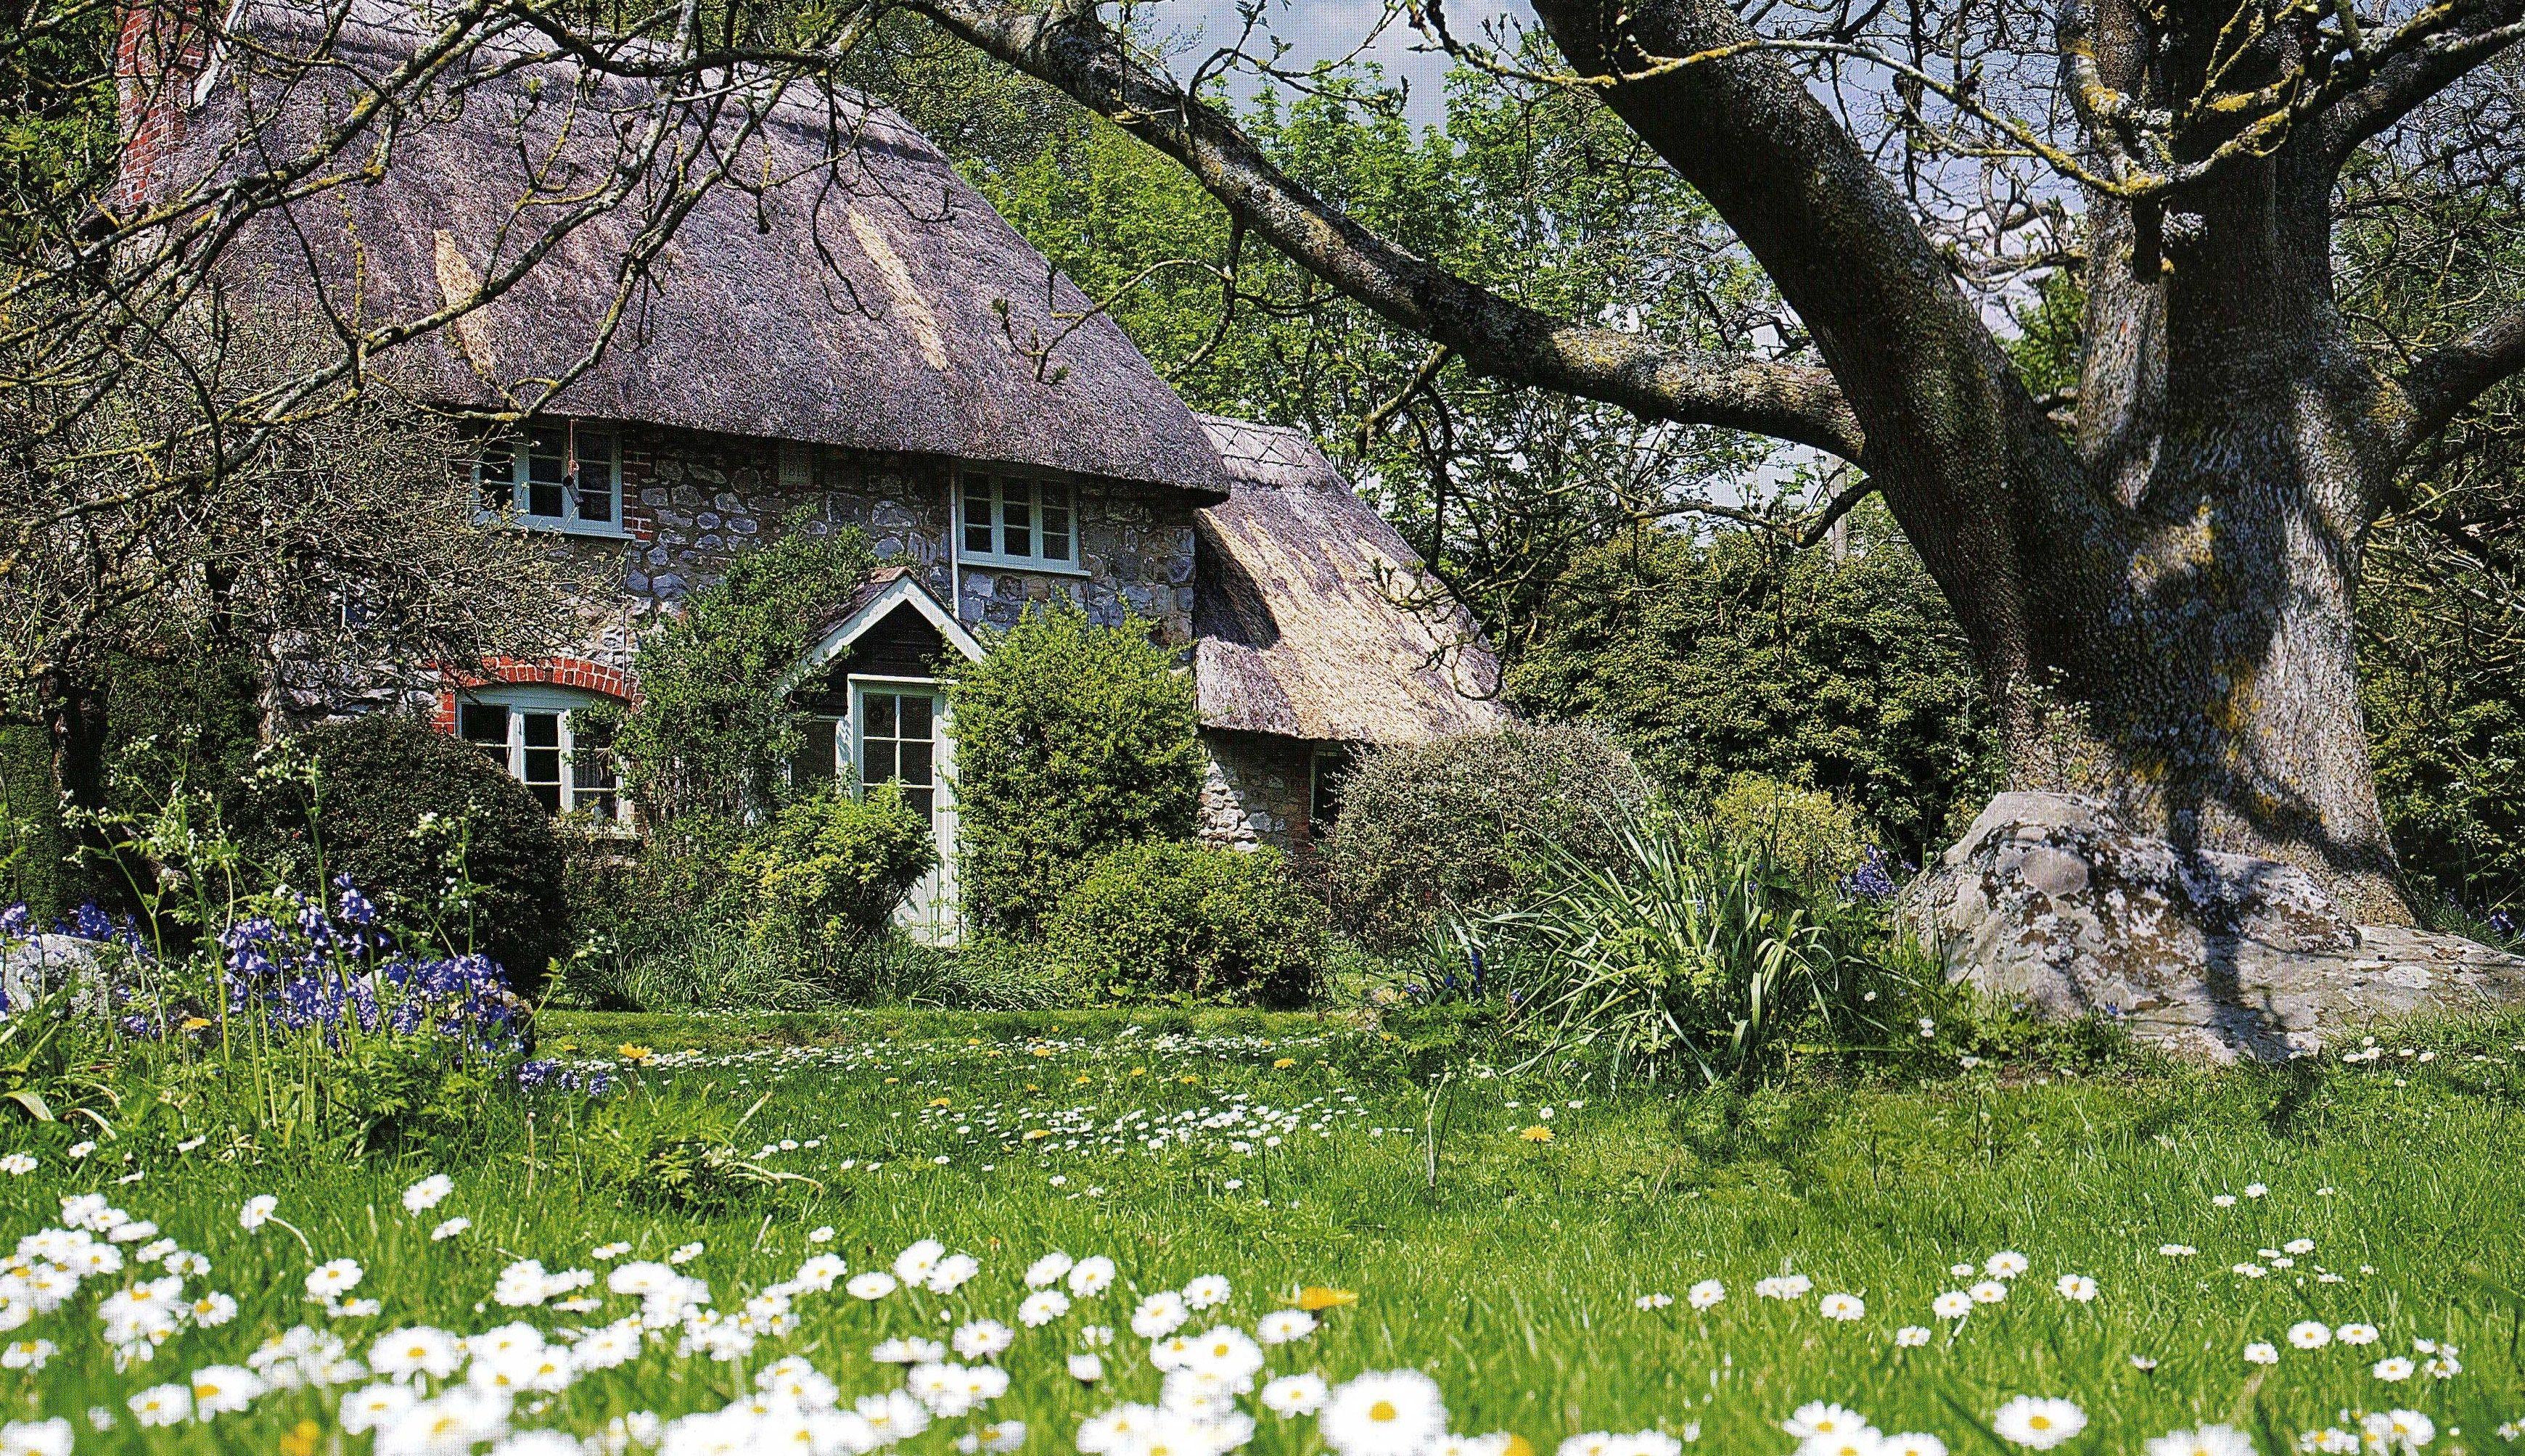 Traditional Thatched Cottage And Garden Village Of Lockeridge Marlborough Wiltshire Uk Photo By David Marlborough Wiltshire Marlborough Thatched Cottage